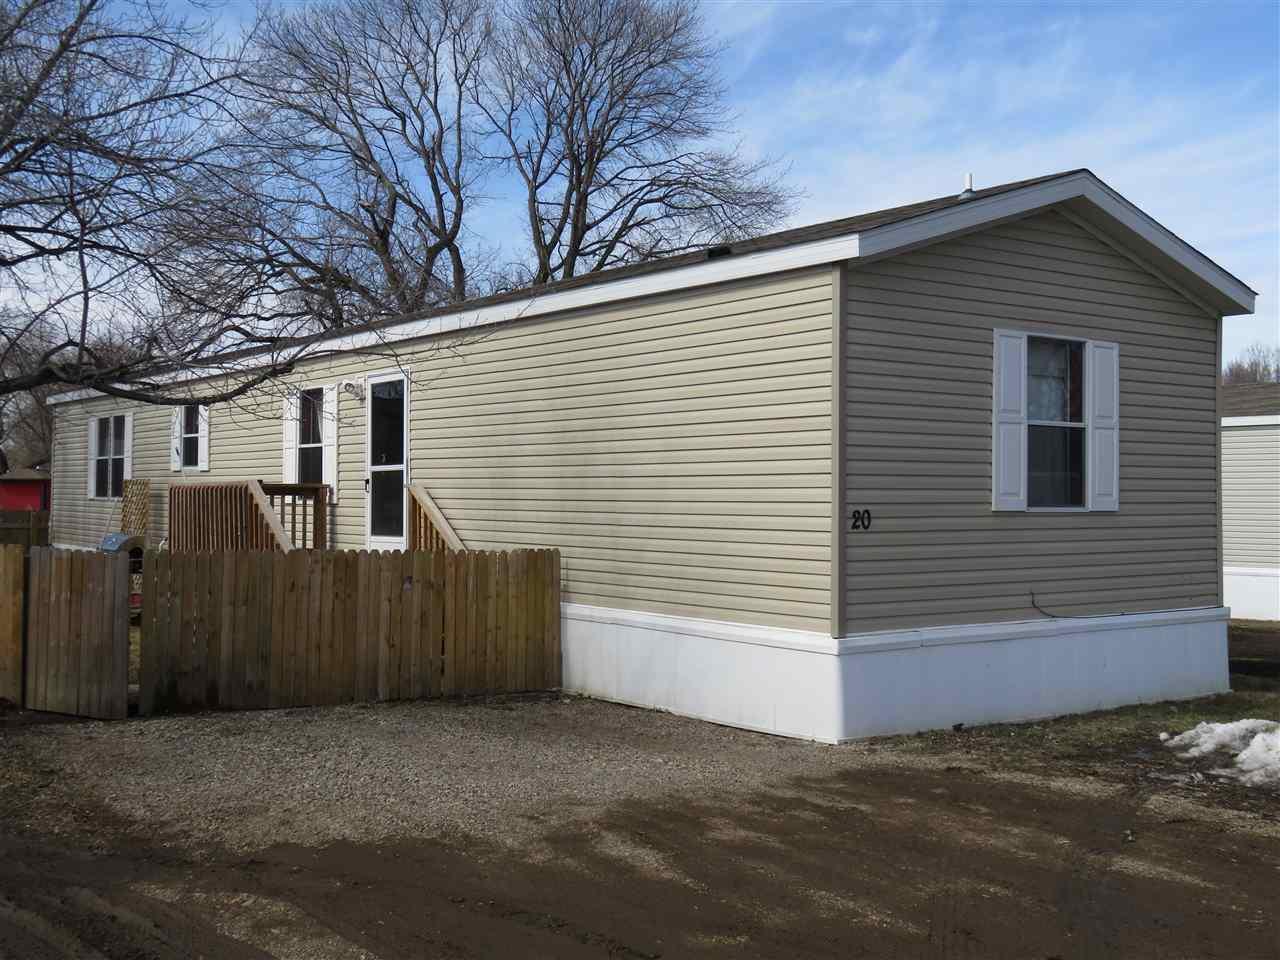 615 COLTON AVE - LOT 20, Burlington, ND 58722